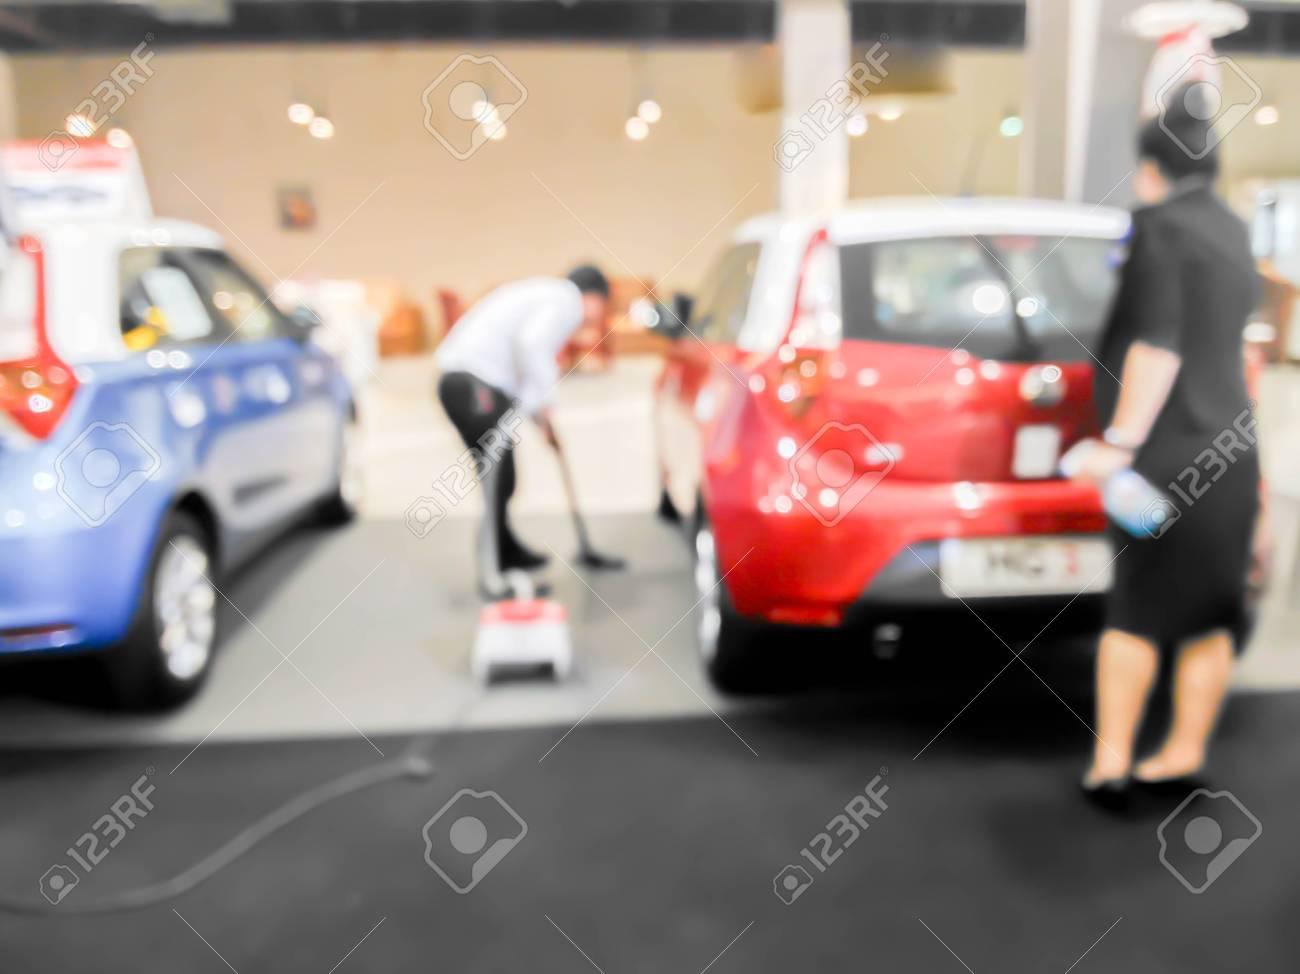 Salesman Clean Floor Of Car Showroom With Vacuum Cleaner Stock